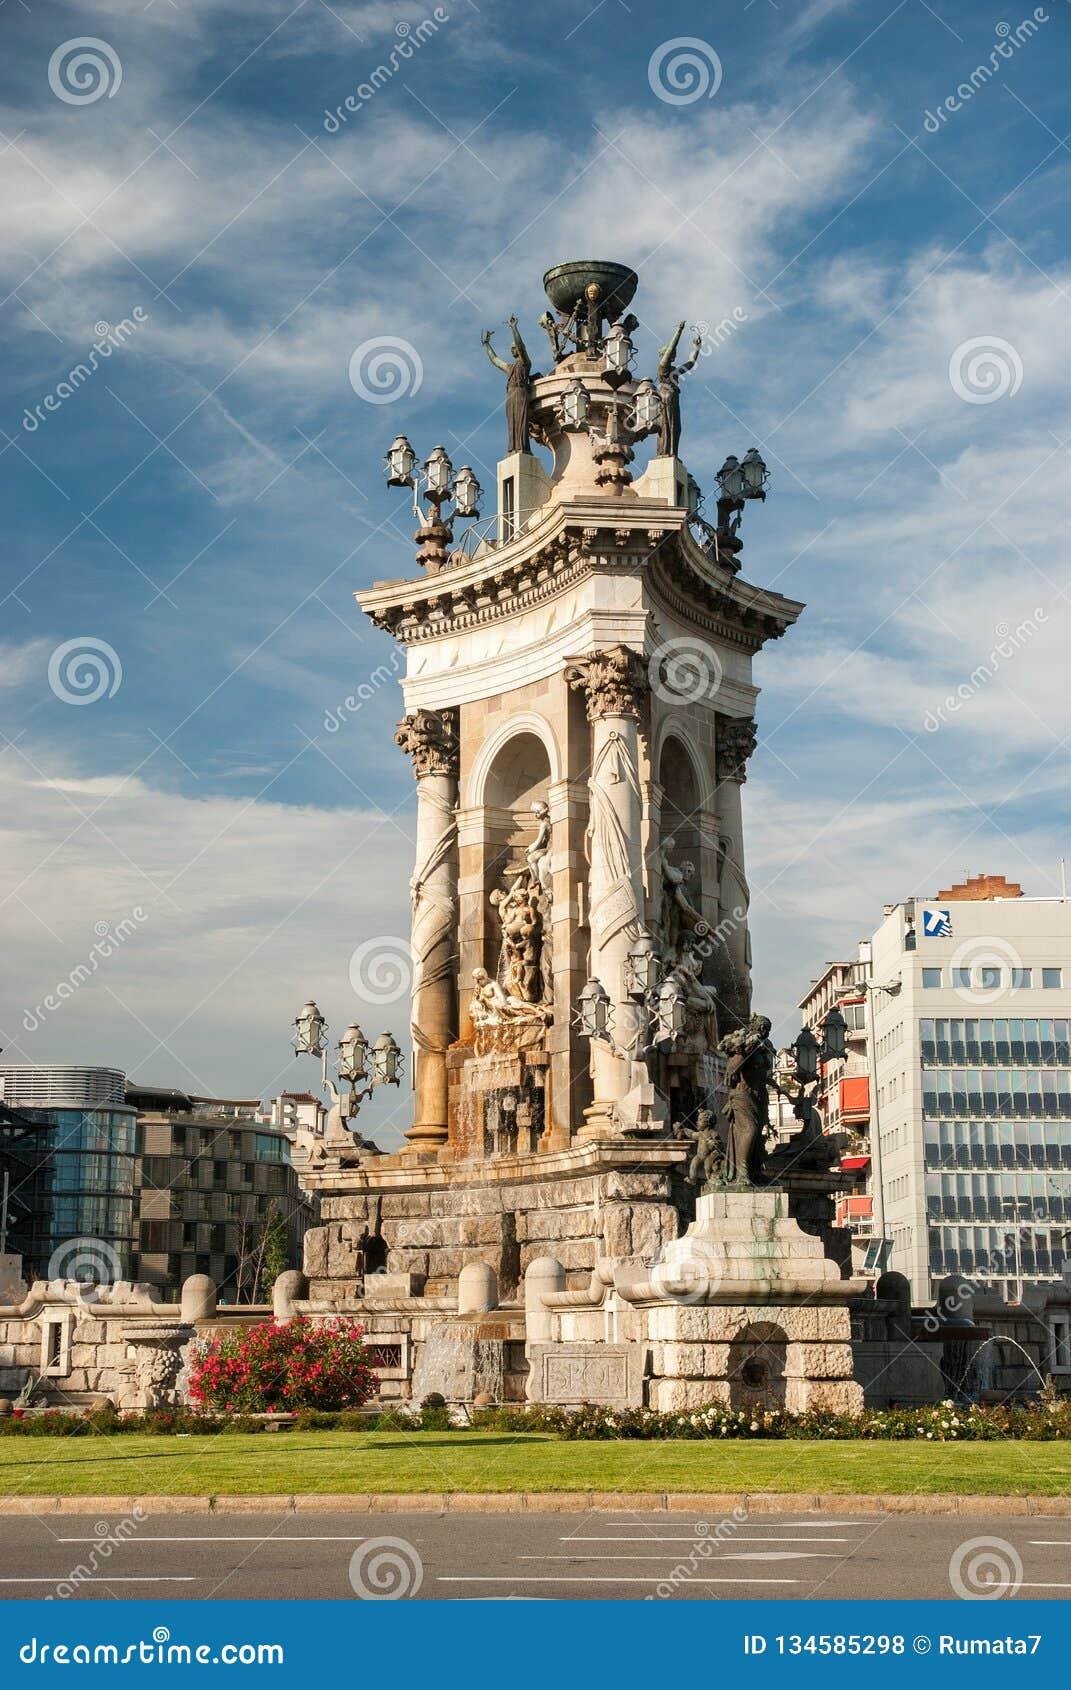 Statues and Fountain at Plaza de Espana in Barcelona, Spain